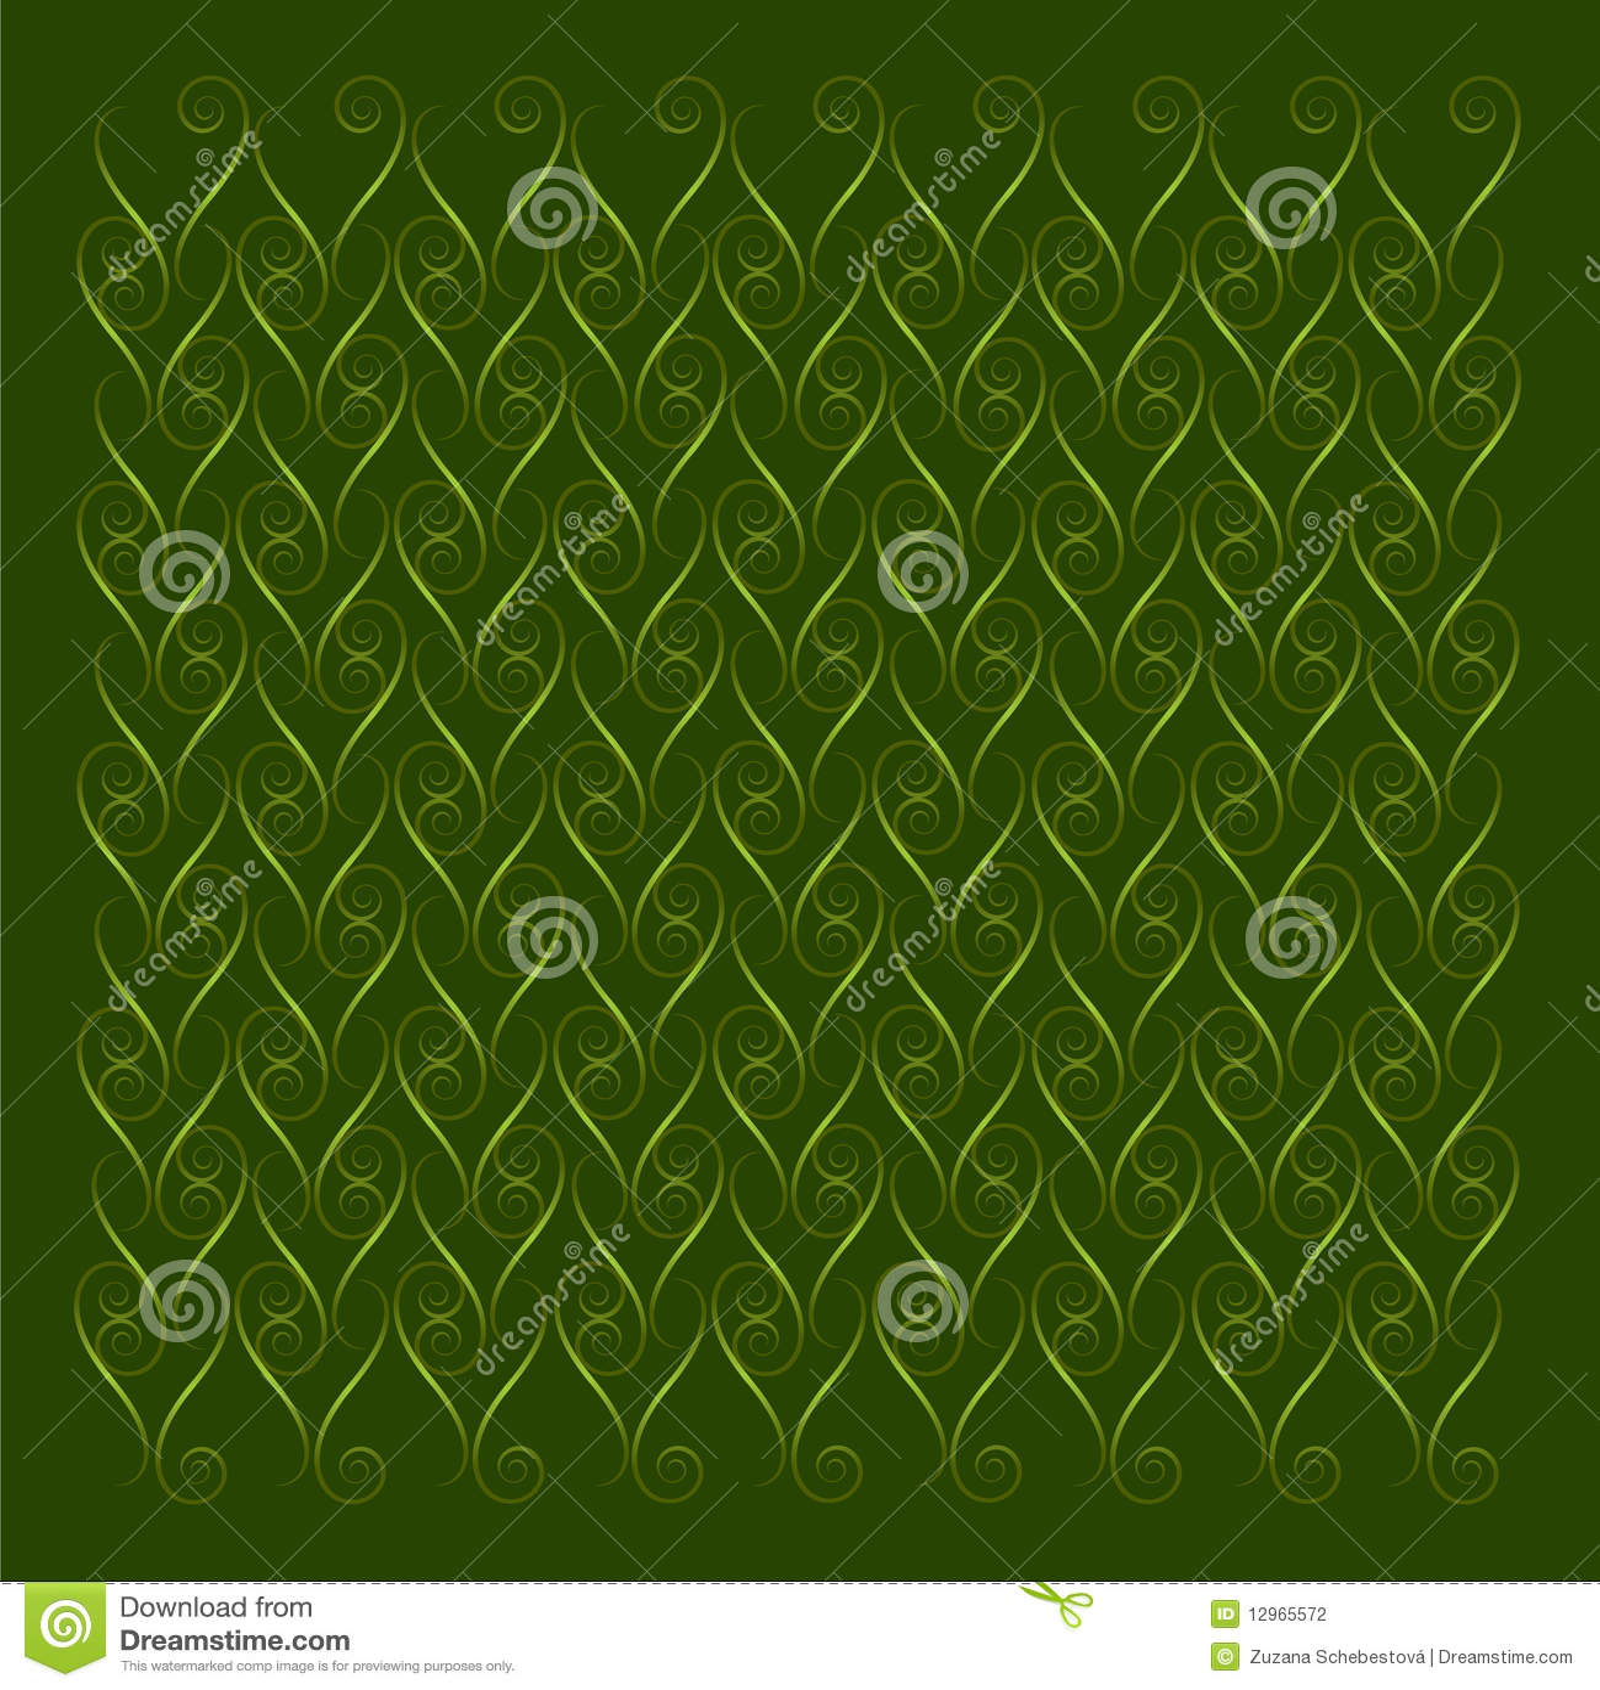 elegant green backgrounds - photo #39